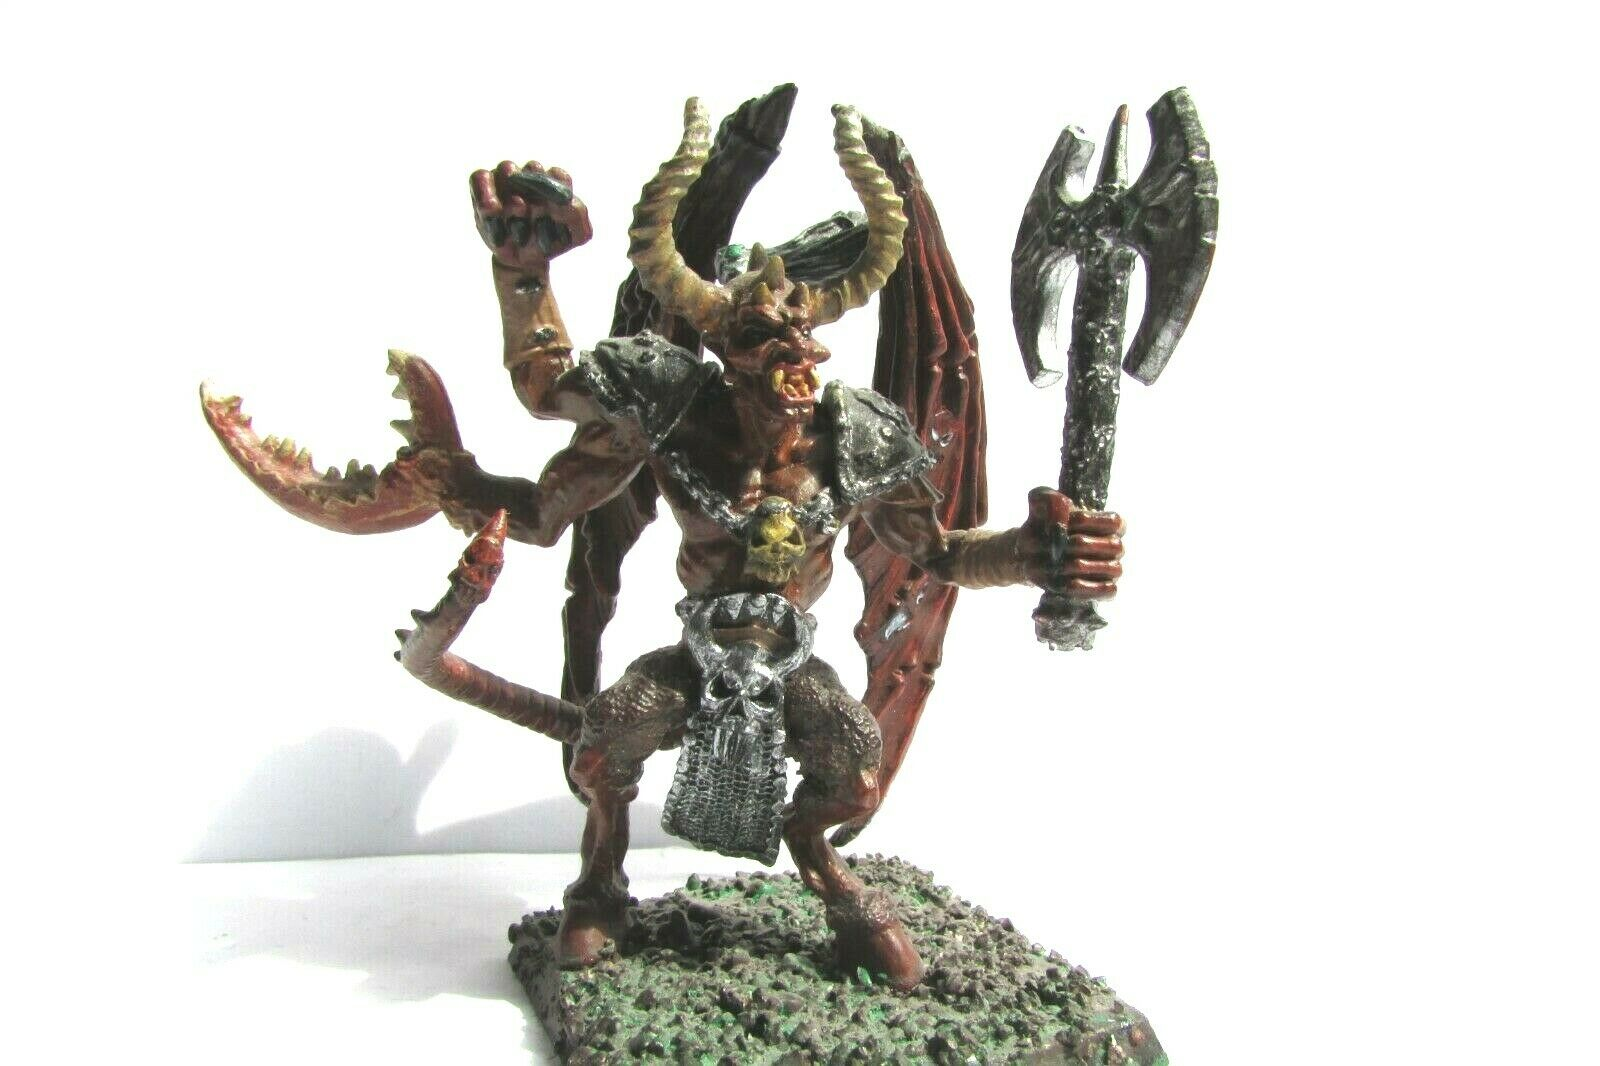 Fuera de imprenta ciudadela Warhammer metal caos demonios Daemon Prince